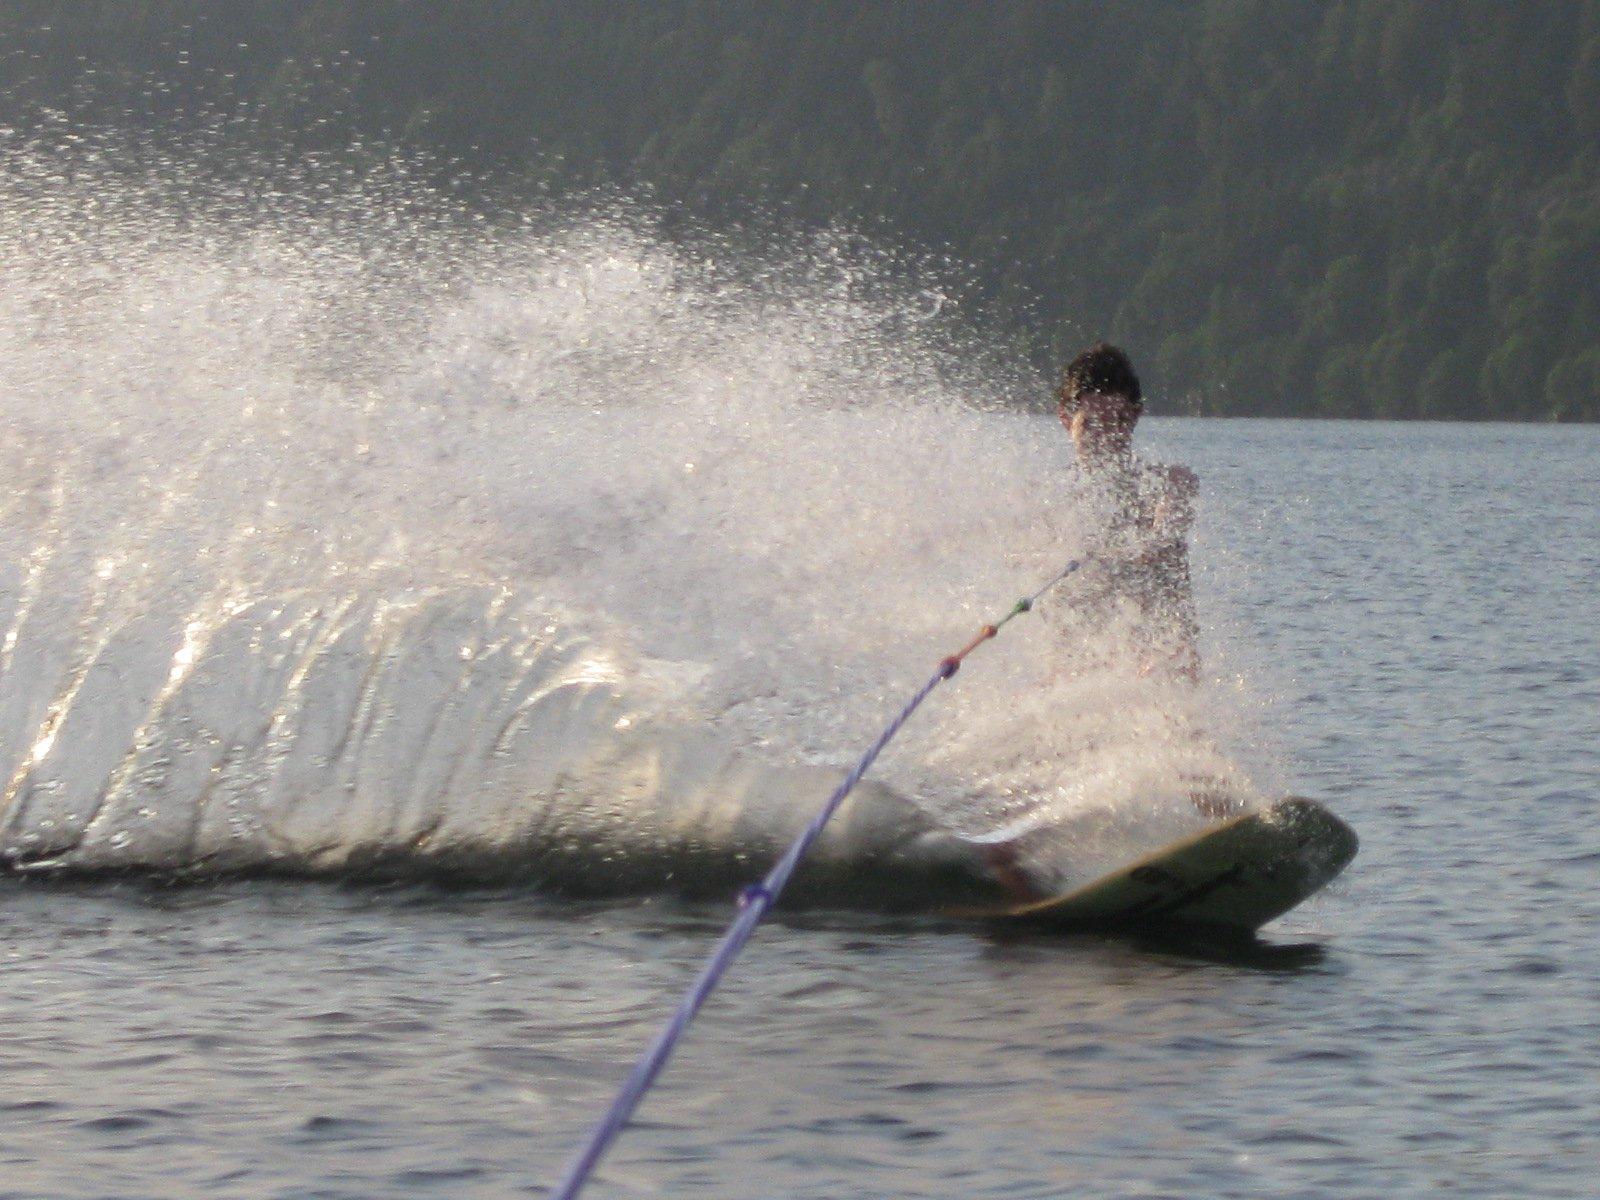 Summer fun-wakeskate